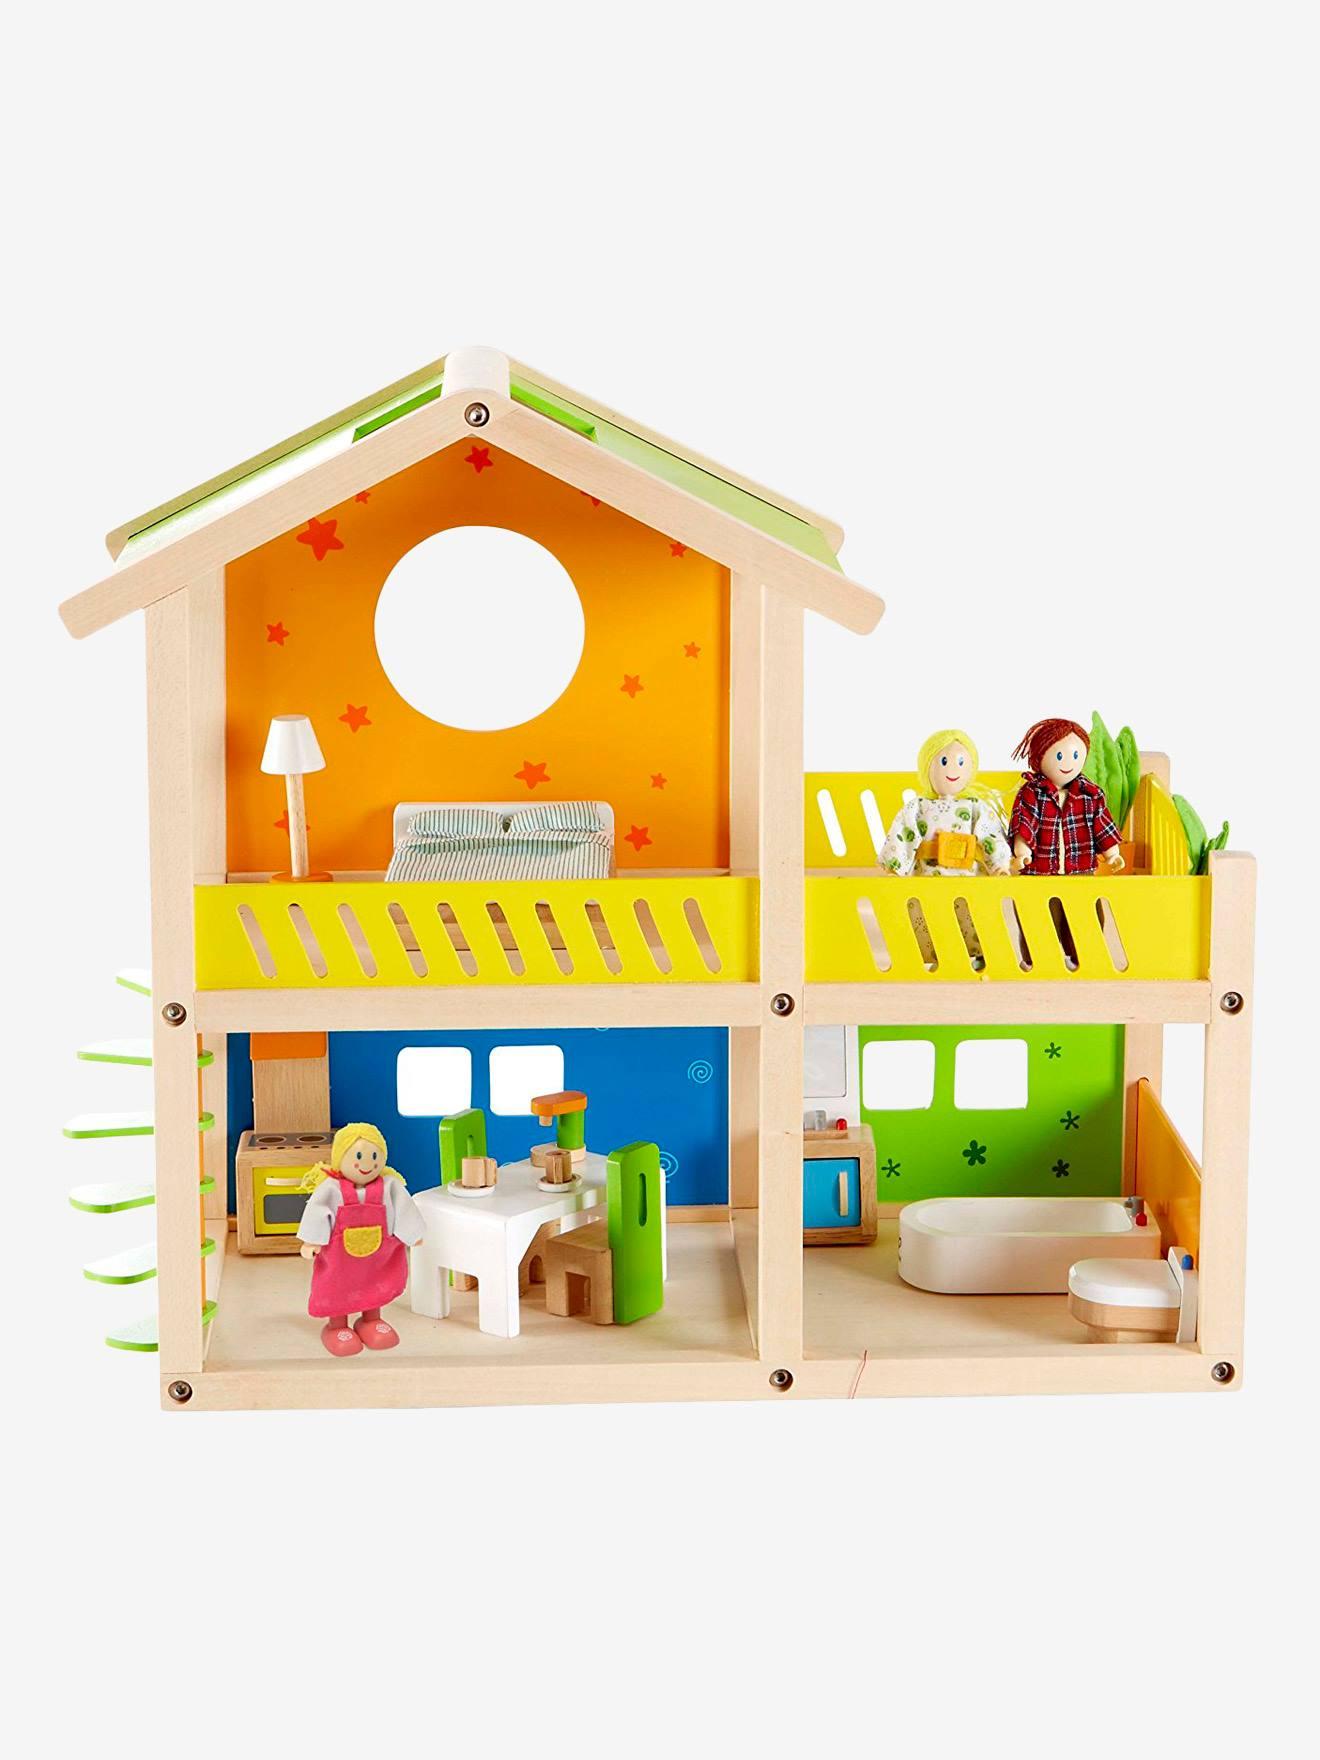 Petite maison joyeuse en bois HAPE multicolore